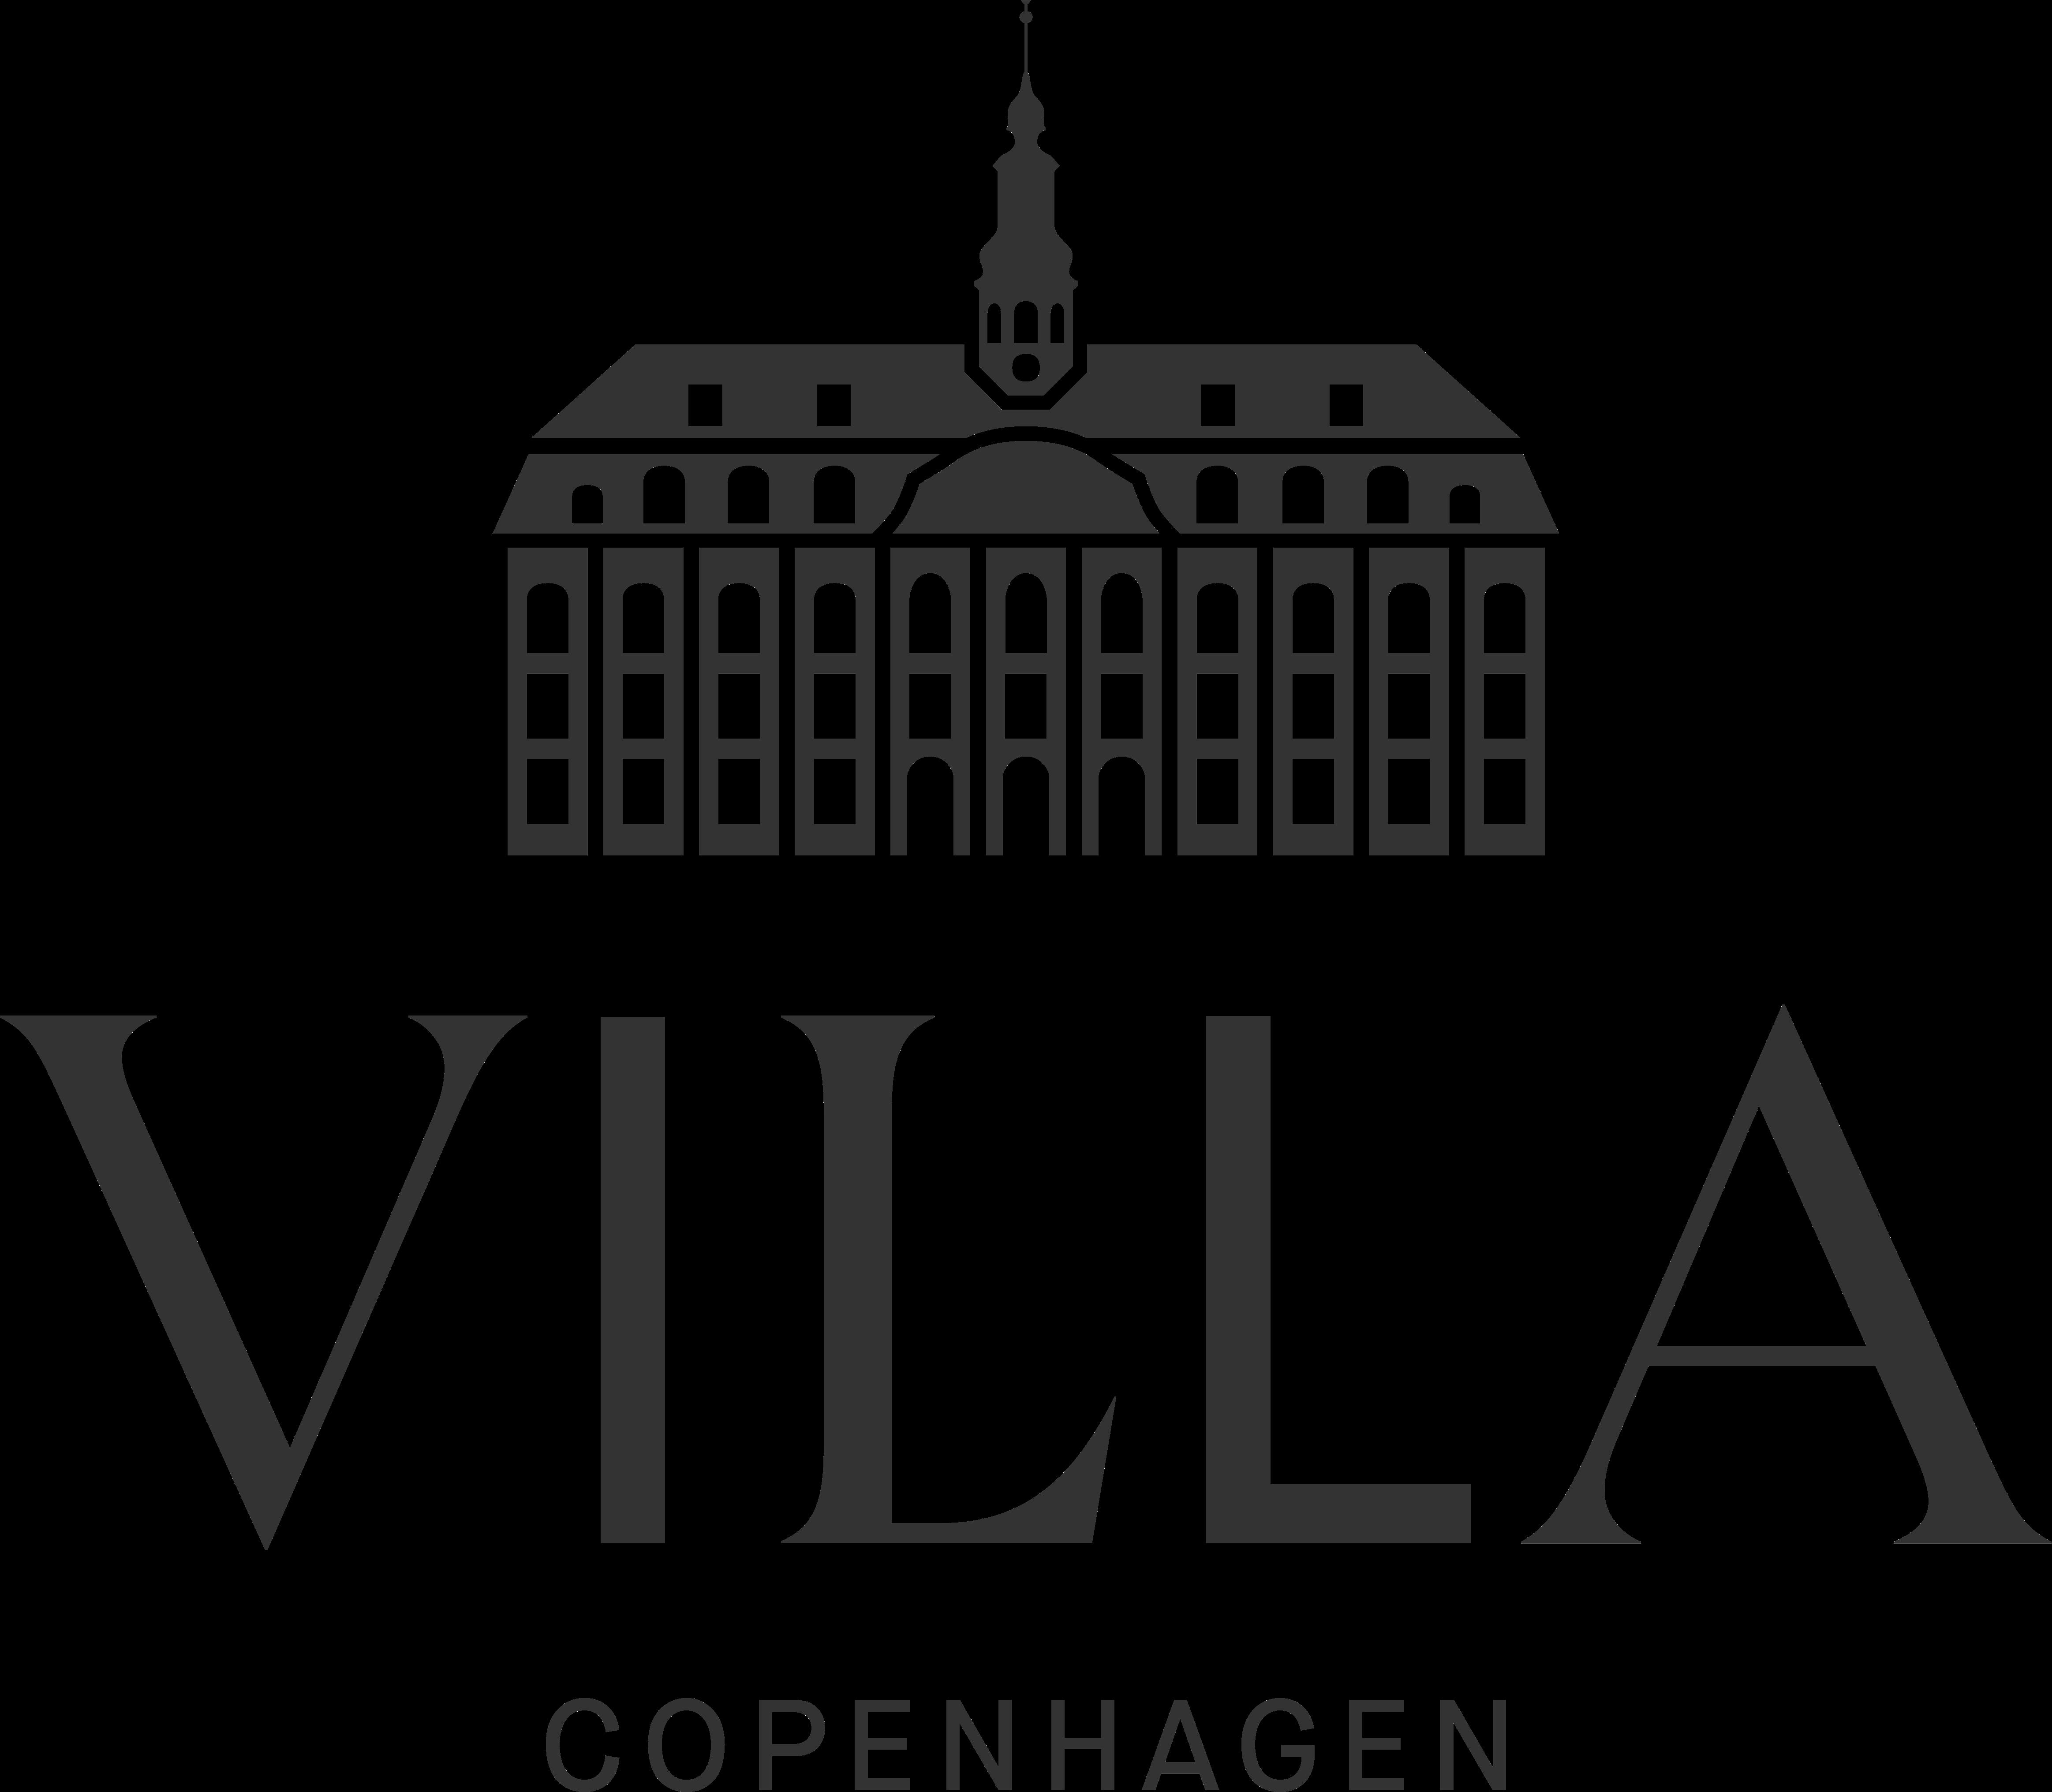 logo-black-on-white-copy-24